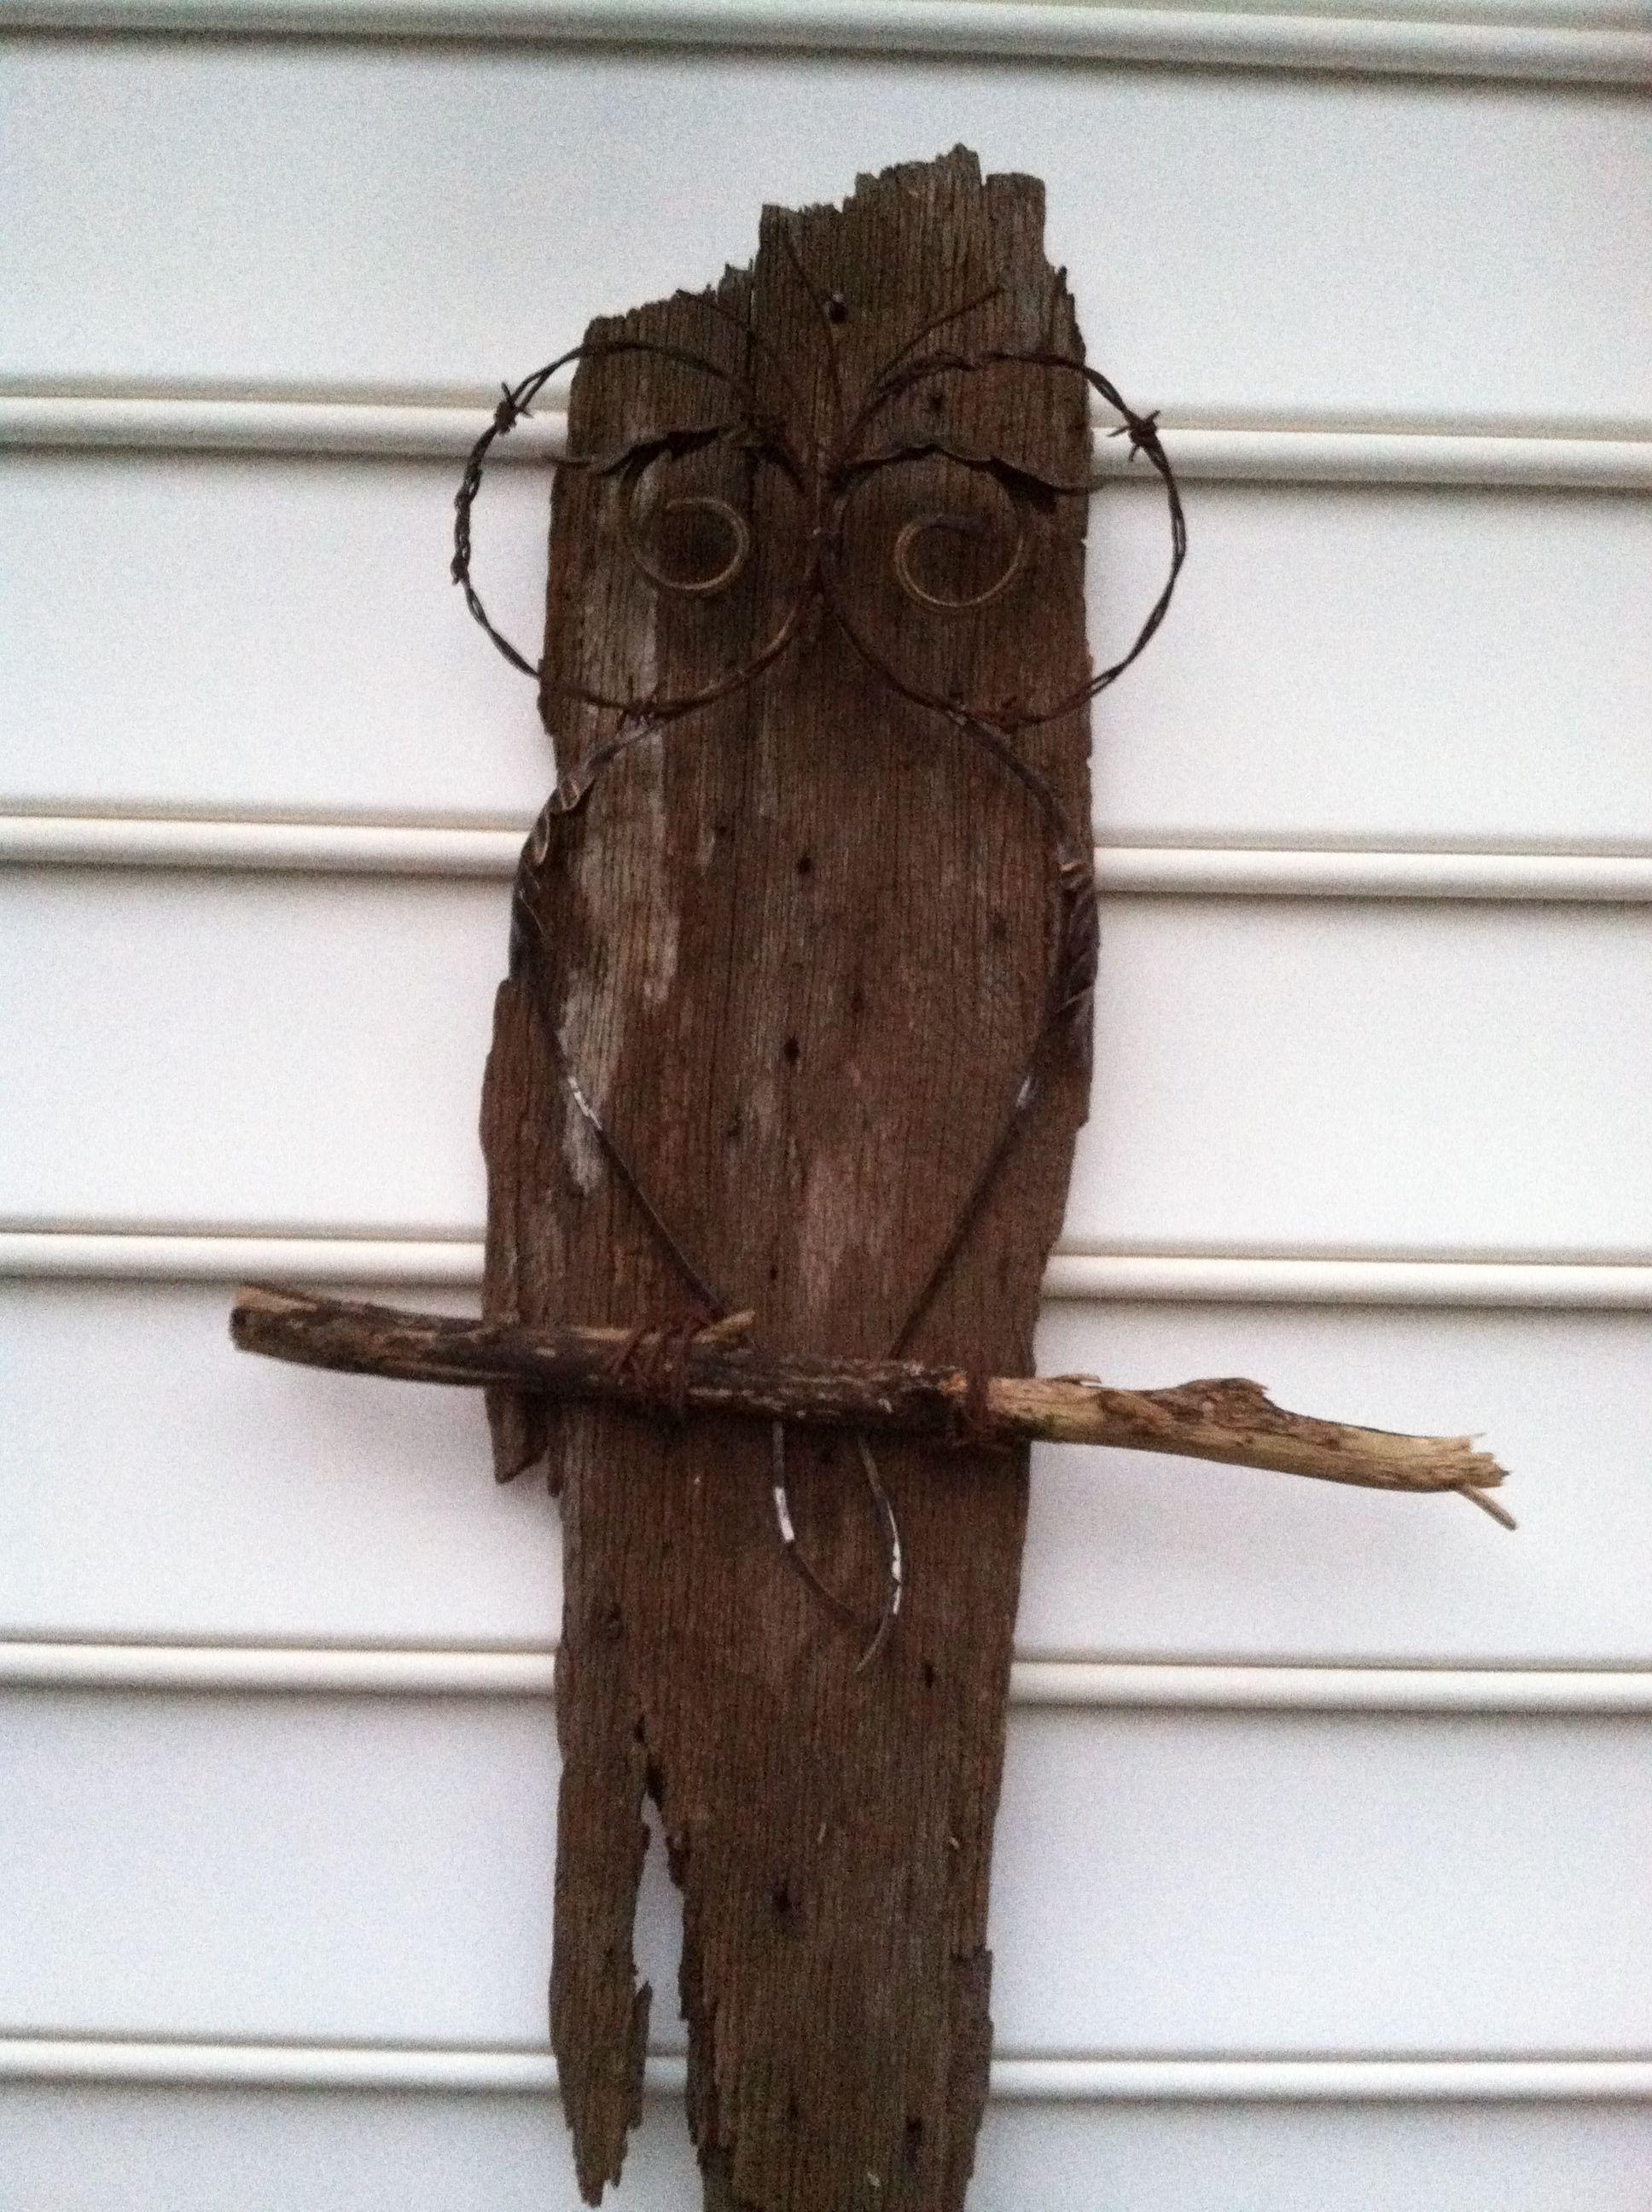 Barn wood owl crafts i wanna make pinterest barn wood owl